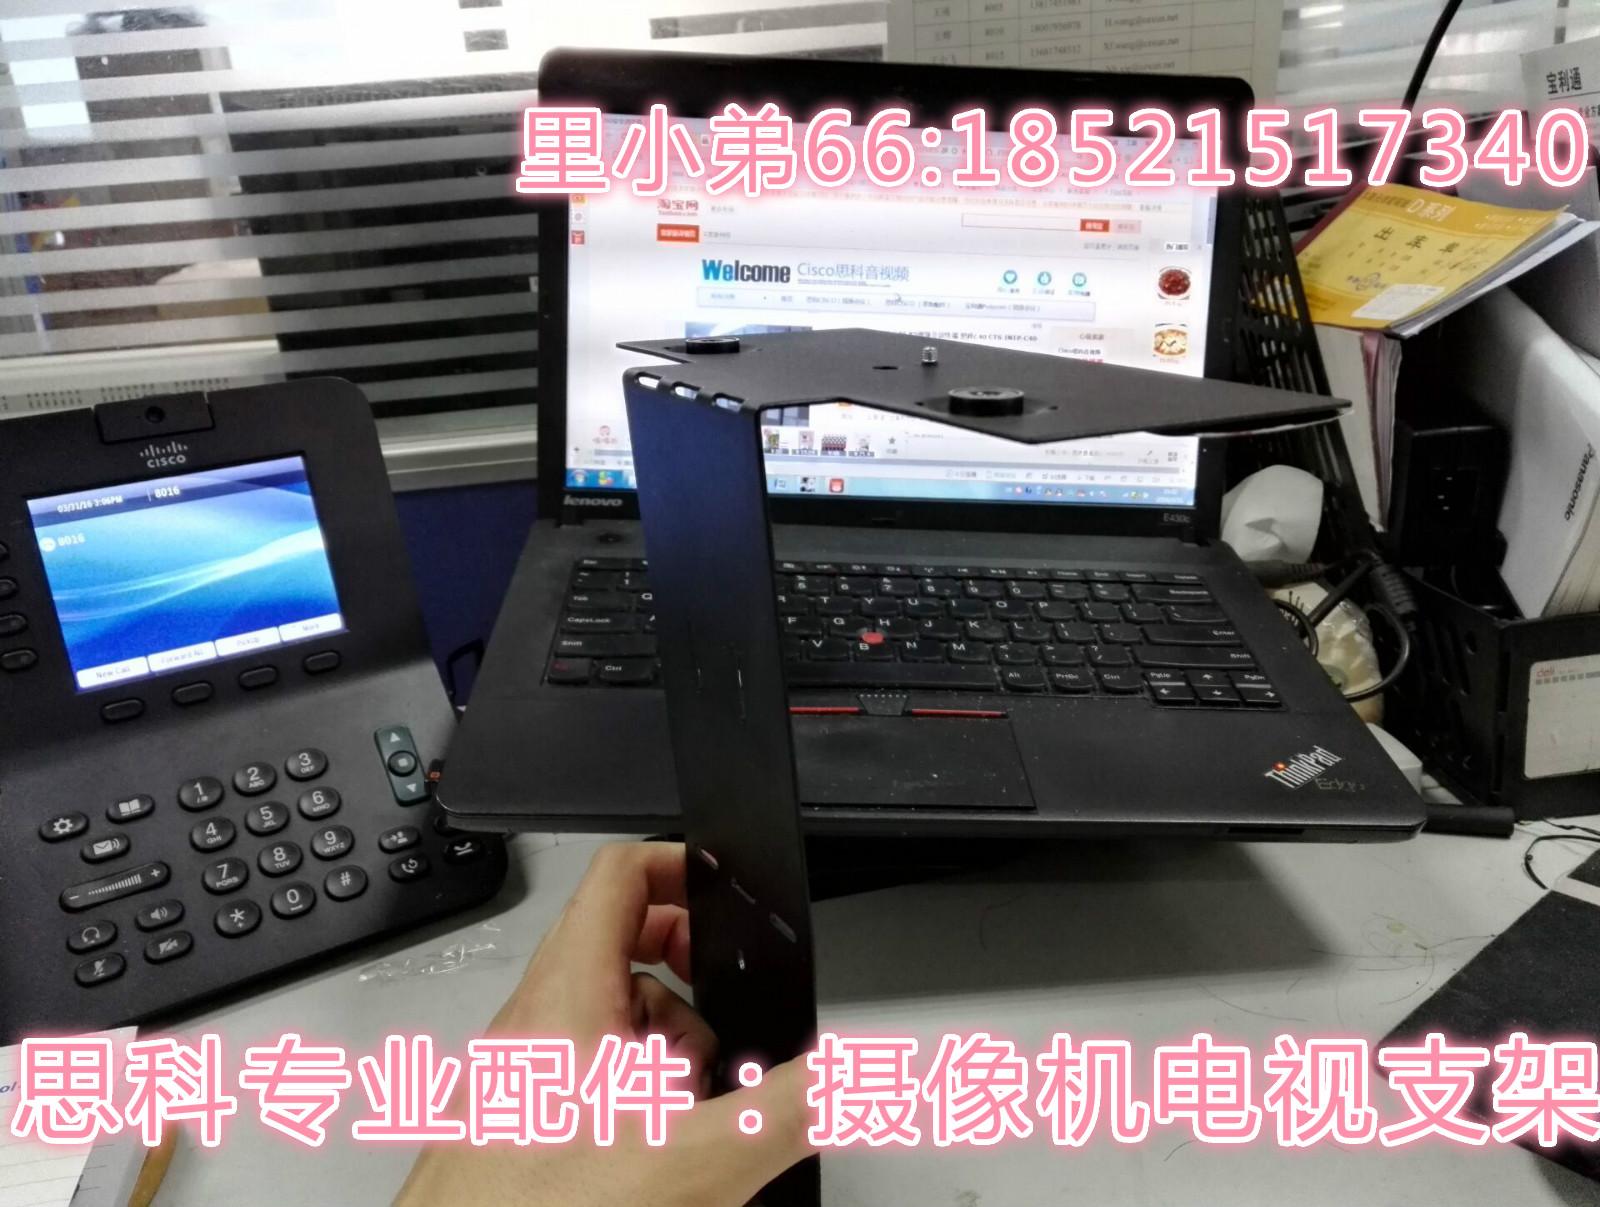 BRKT-12X-MONITORR=Cisco SX20 camera lens mount